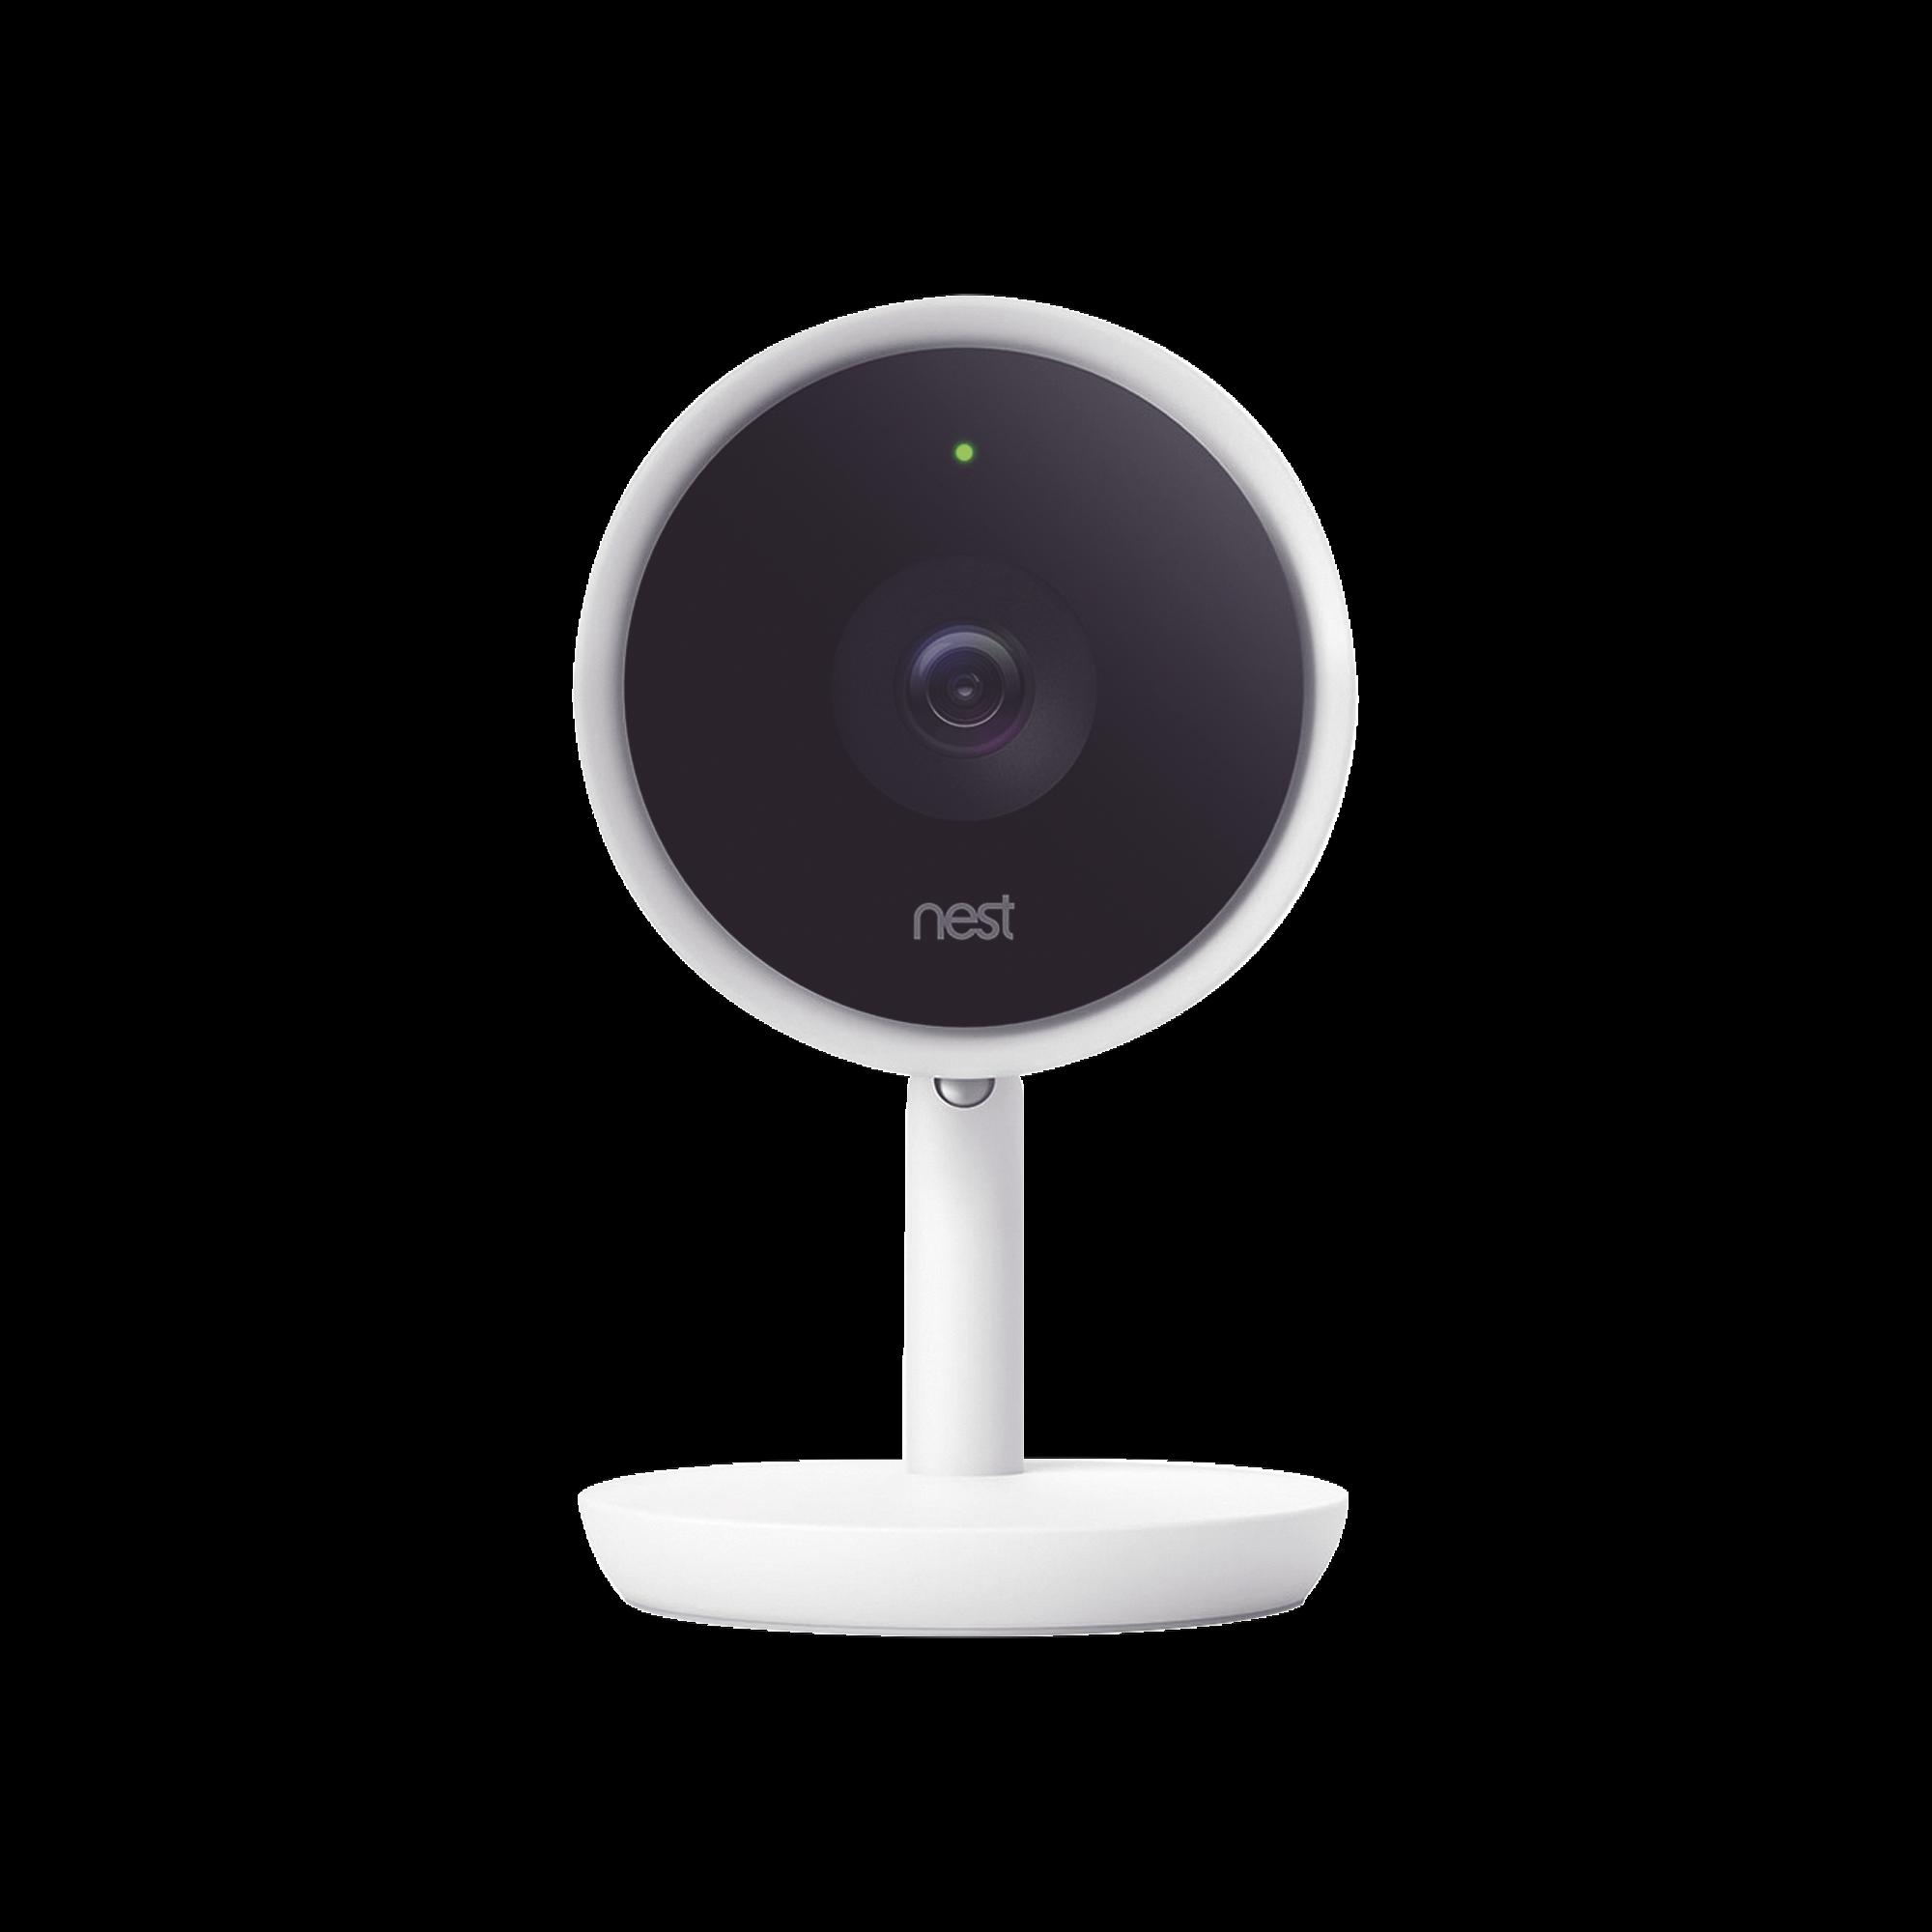 Google Nest / Nest Cam Cámara para interiores IQ -  Cuenta con asistente de Google integrado